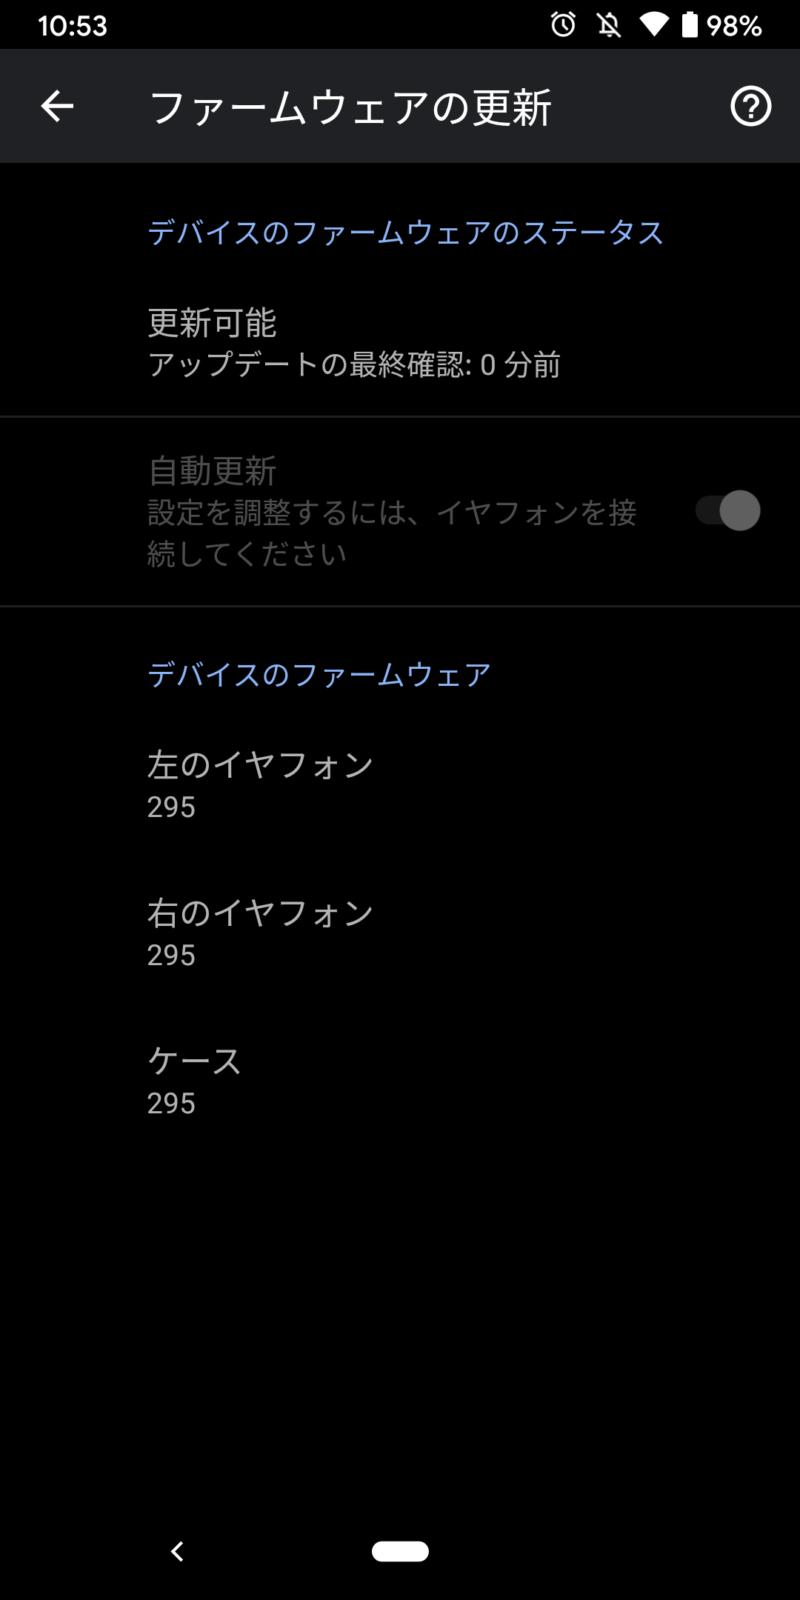 Screenshot 20200611 105353 800x1600-Google Pixel Budsのヒスノイズ問題がファームウェア 296で修正